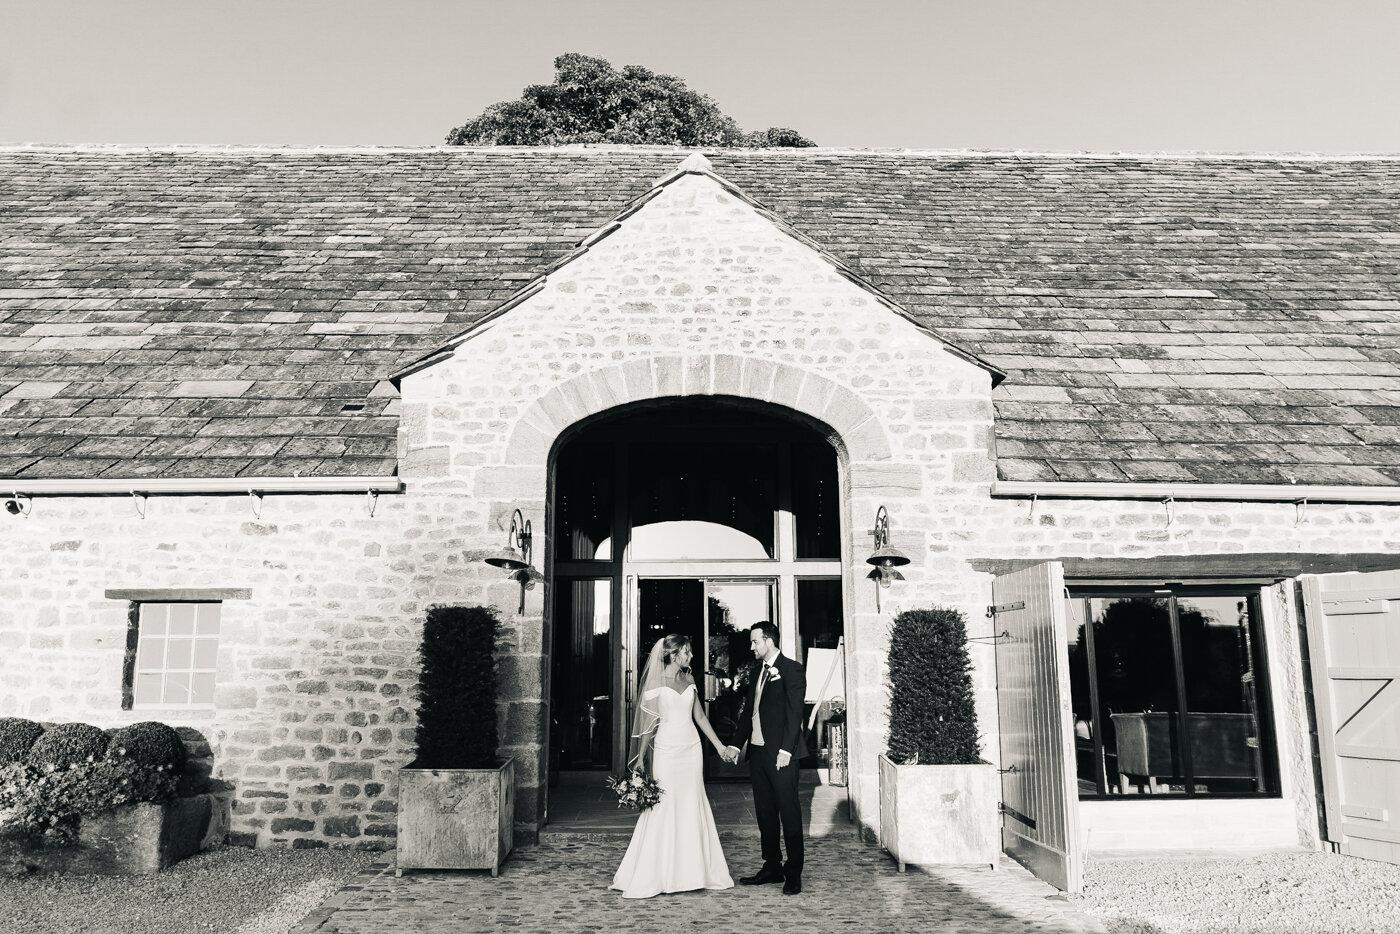 tithe-barn-bolton-abbey-north-yorkshire-cripps-wedding-photographer-creative-0050.jpg